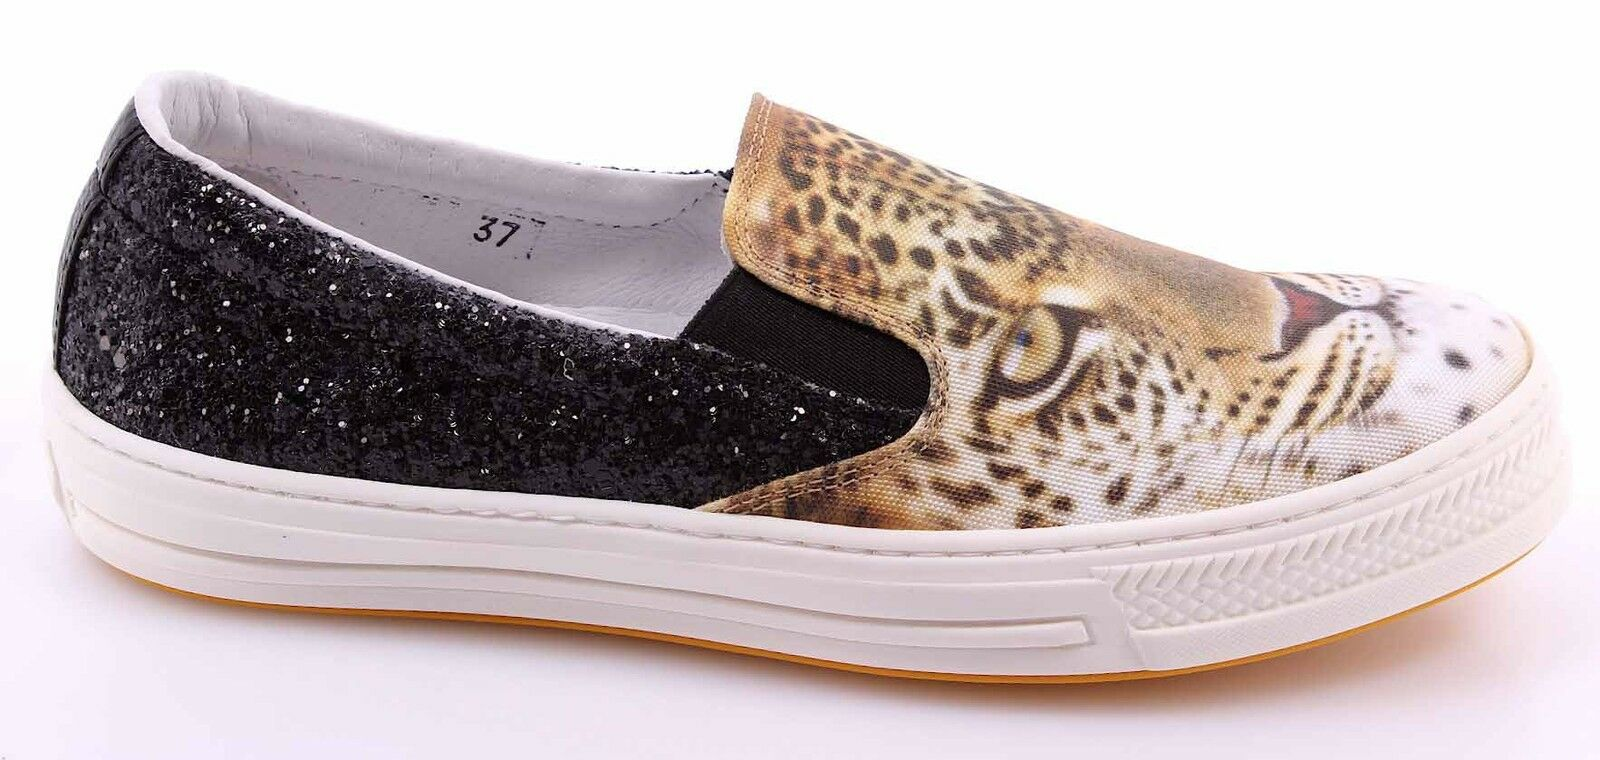 Women's Slip On Sneakers CHANGE  Giaguaro Raso Bianco Glitter black Made